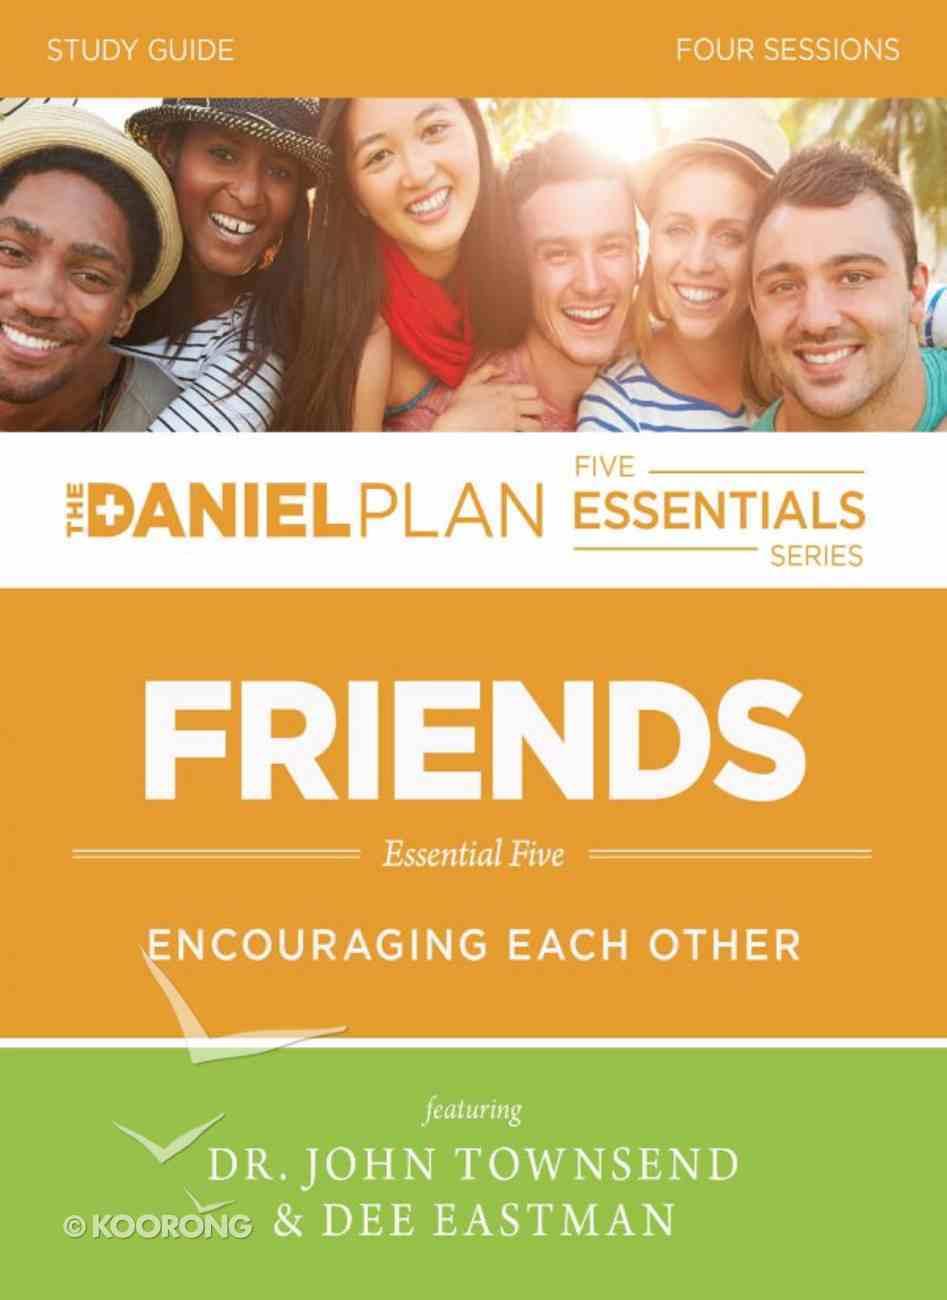 Friends Study Guide (The Daniel Plan Essentials Series) eBook